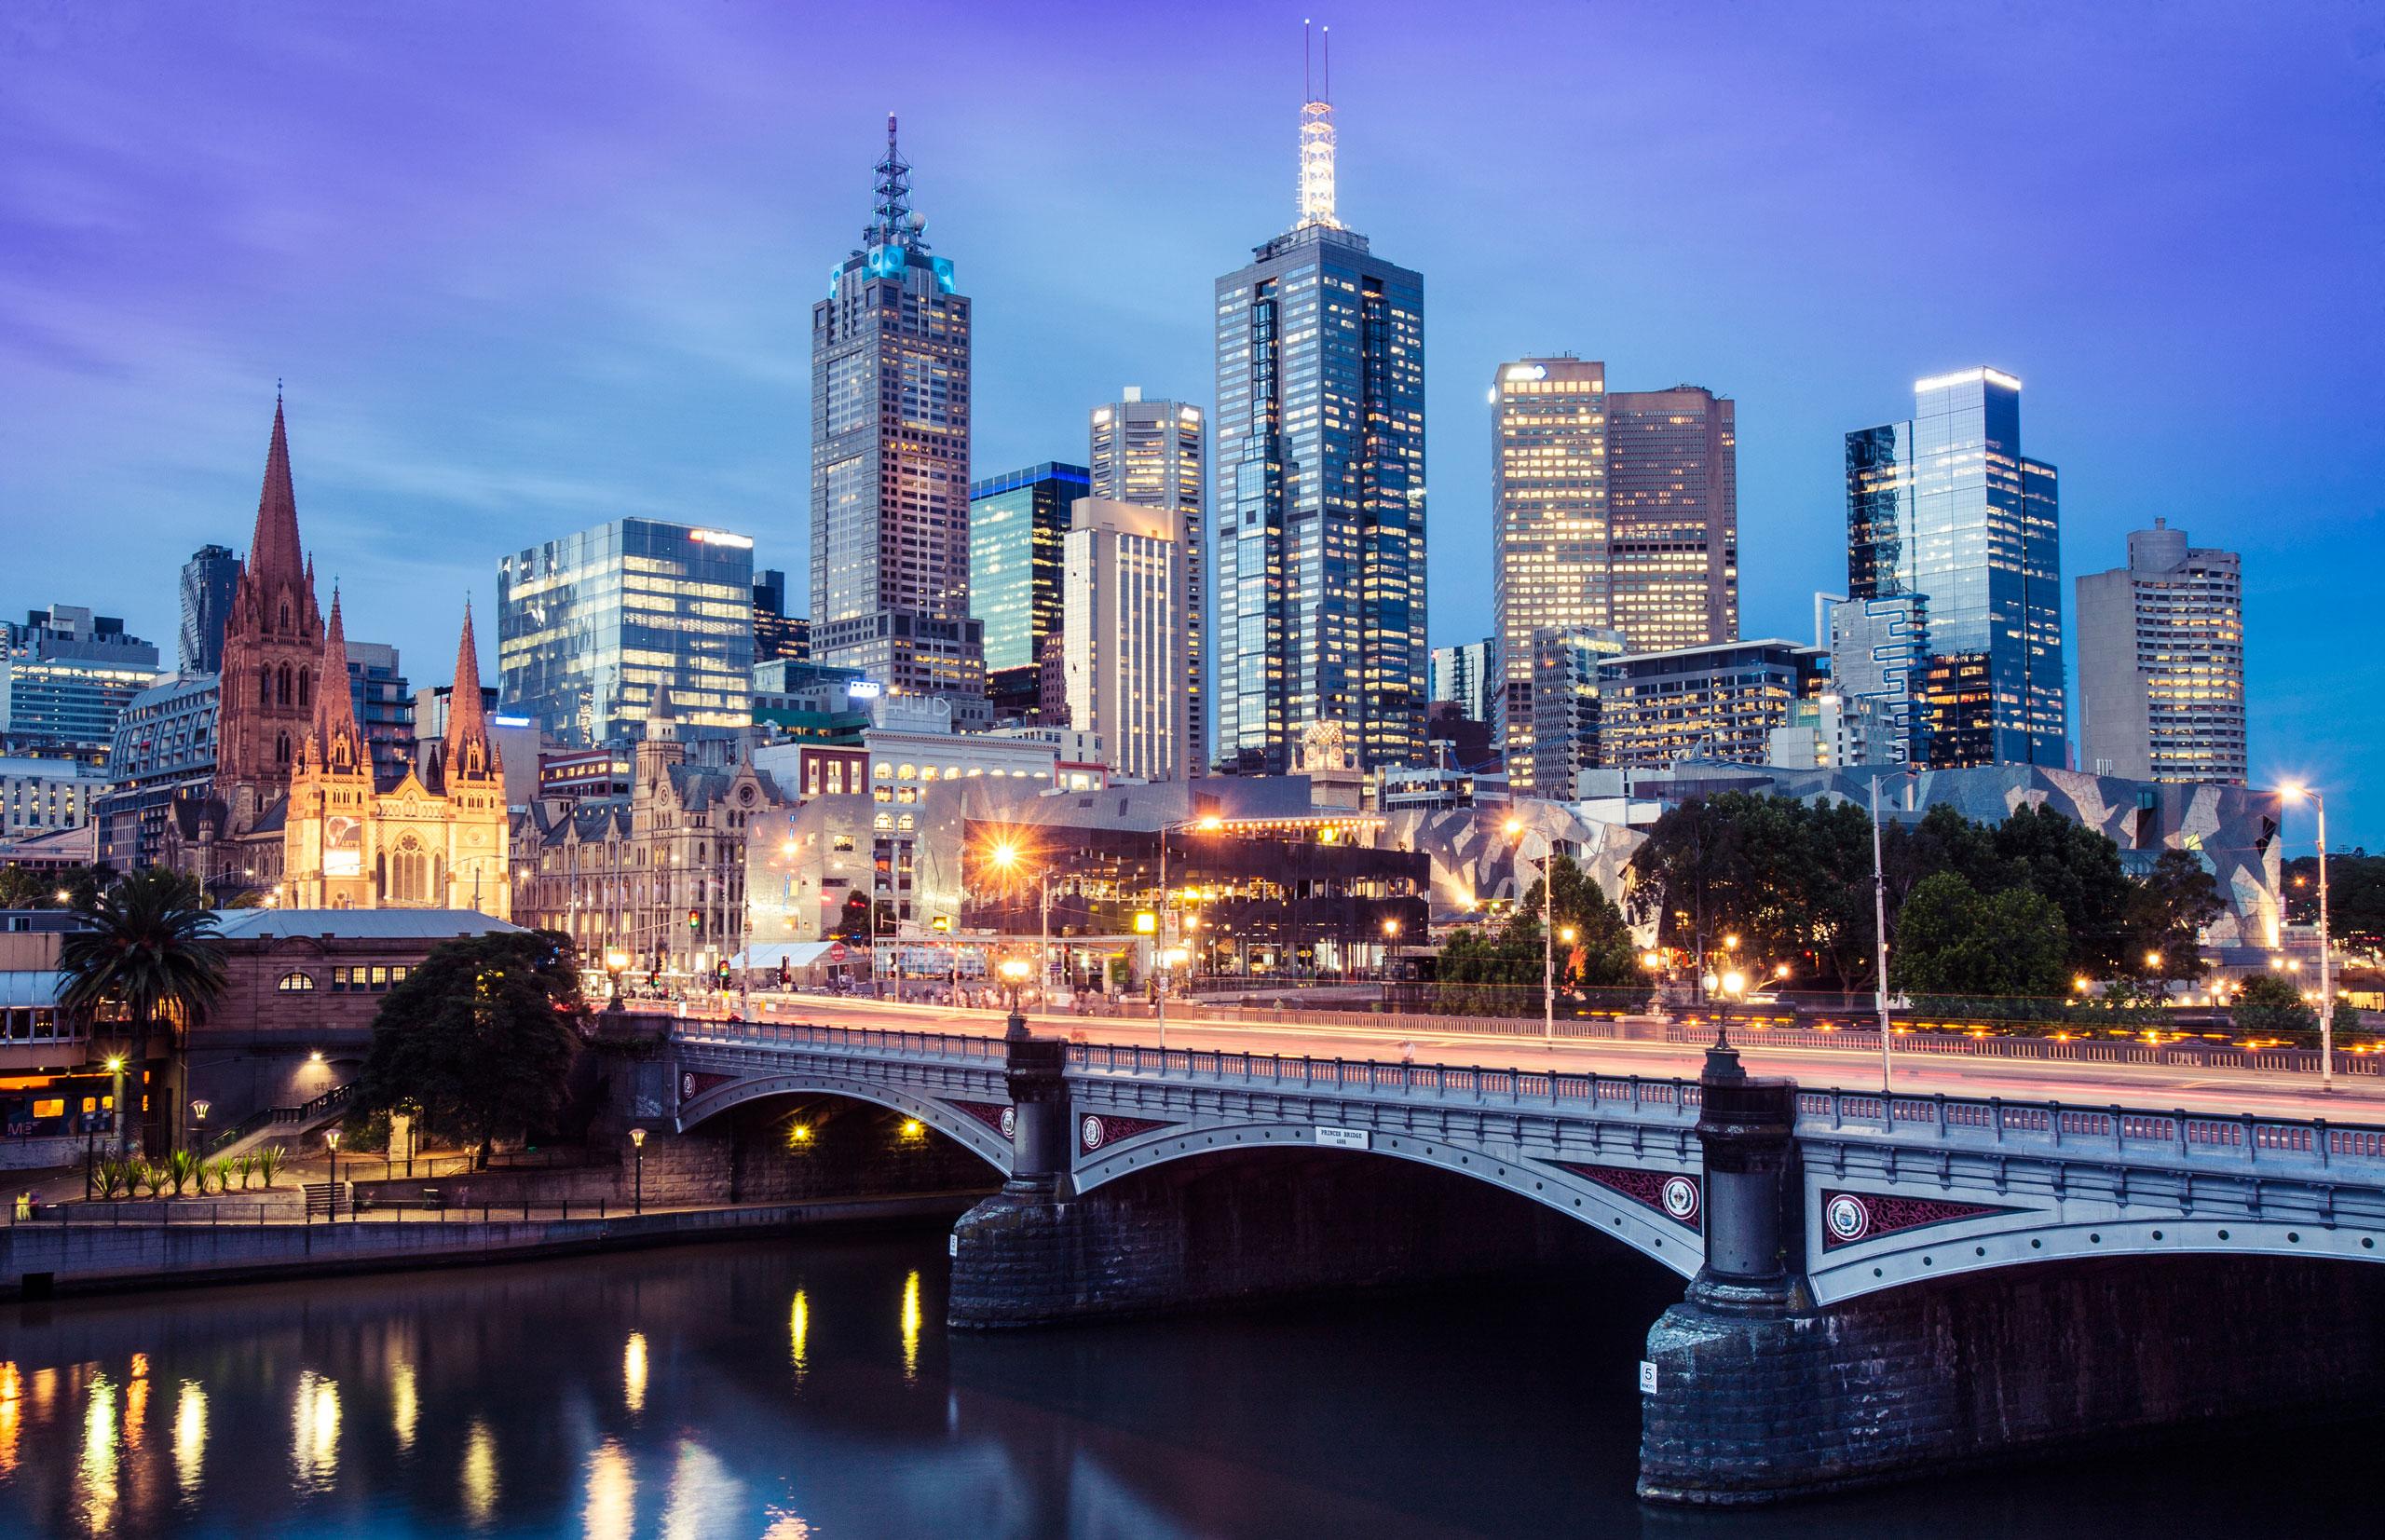 6. Melbourne, Australia